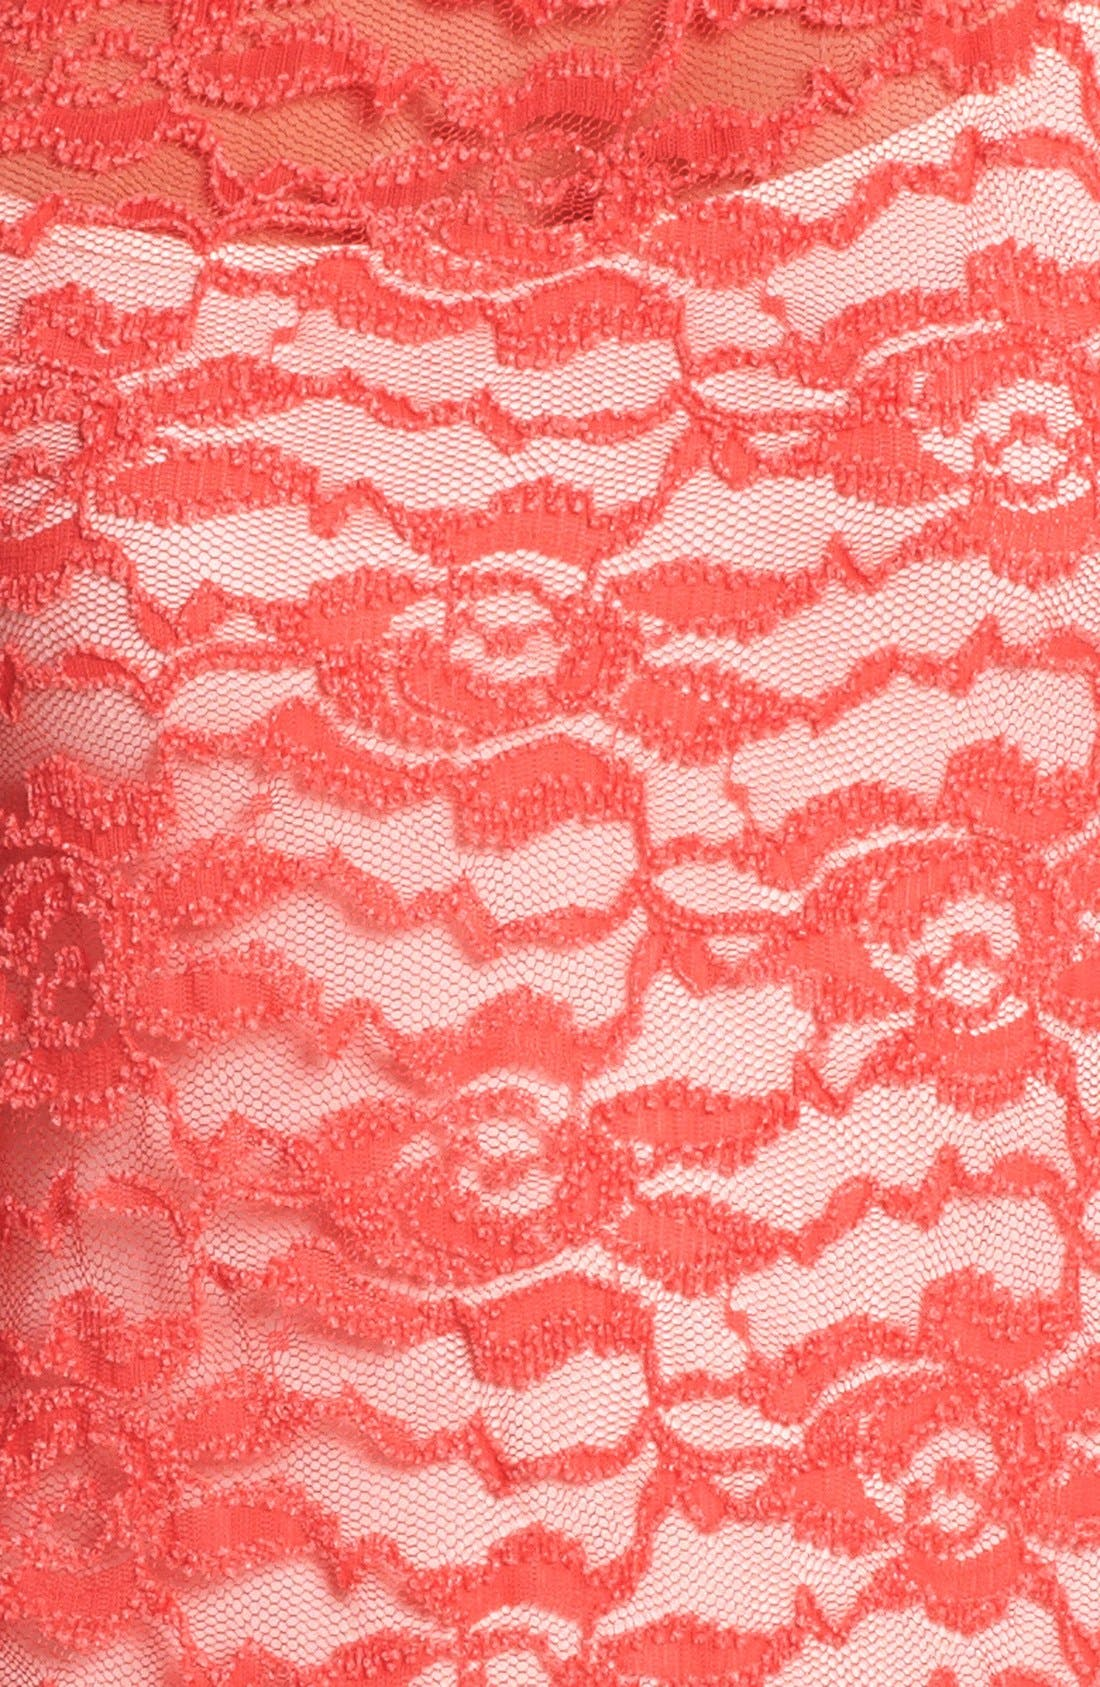 Alternate Image 3  - Pleione Floral Lace Tee